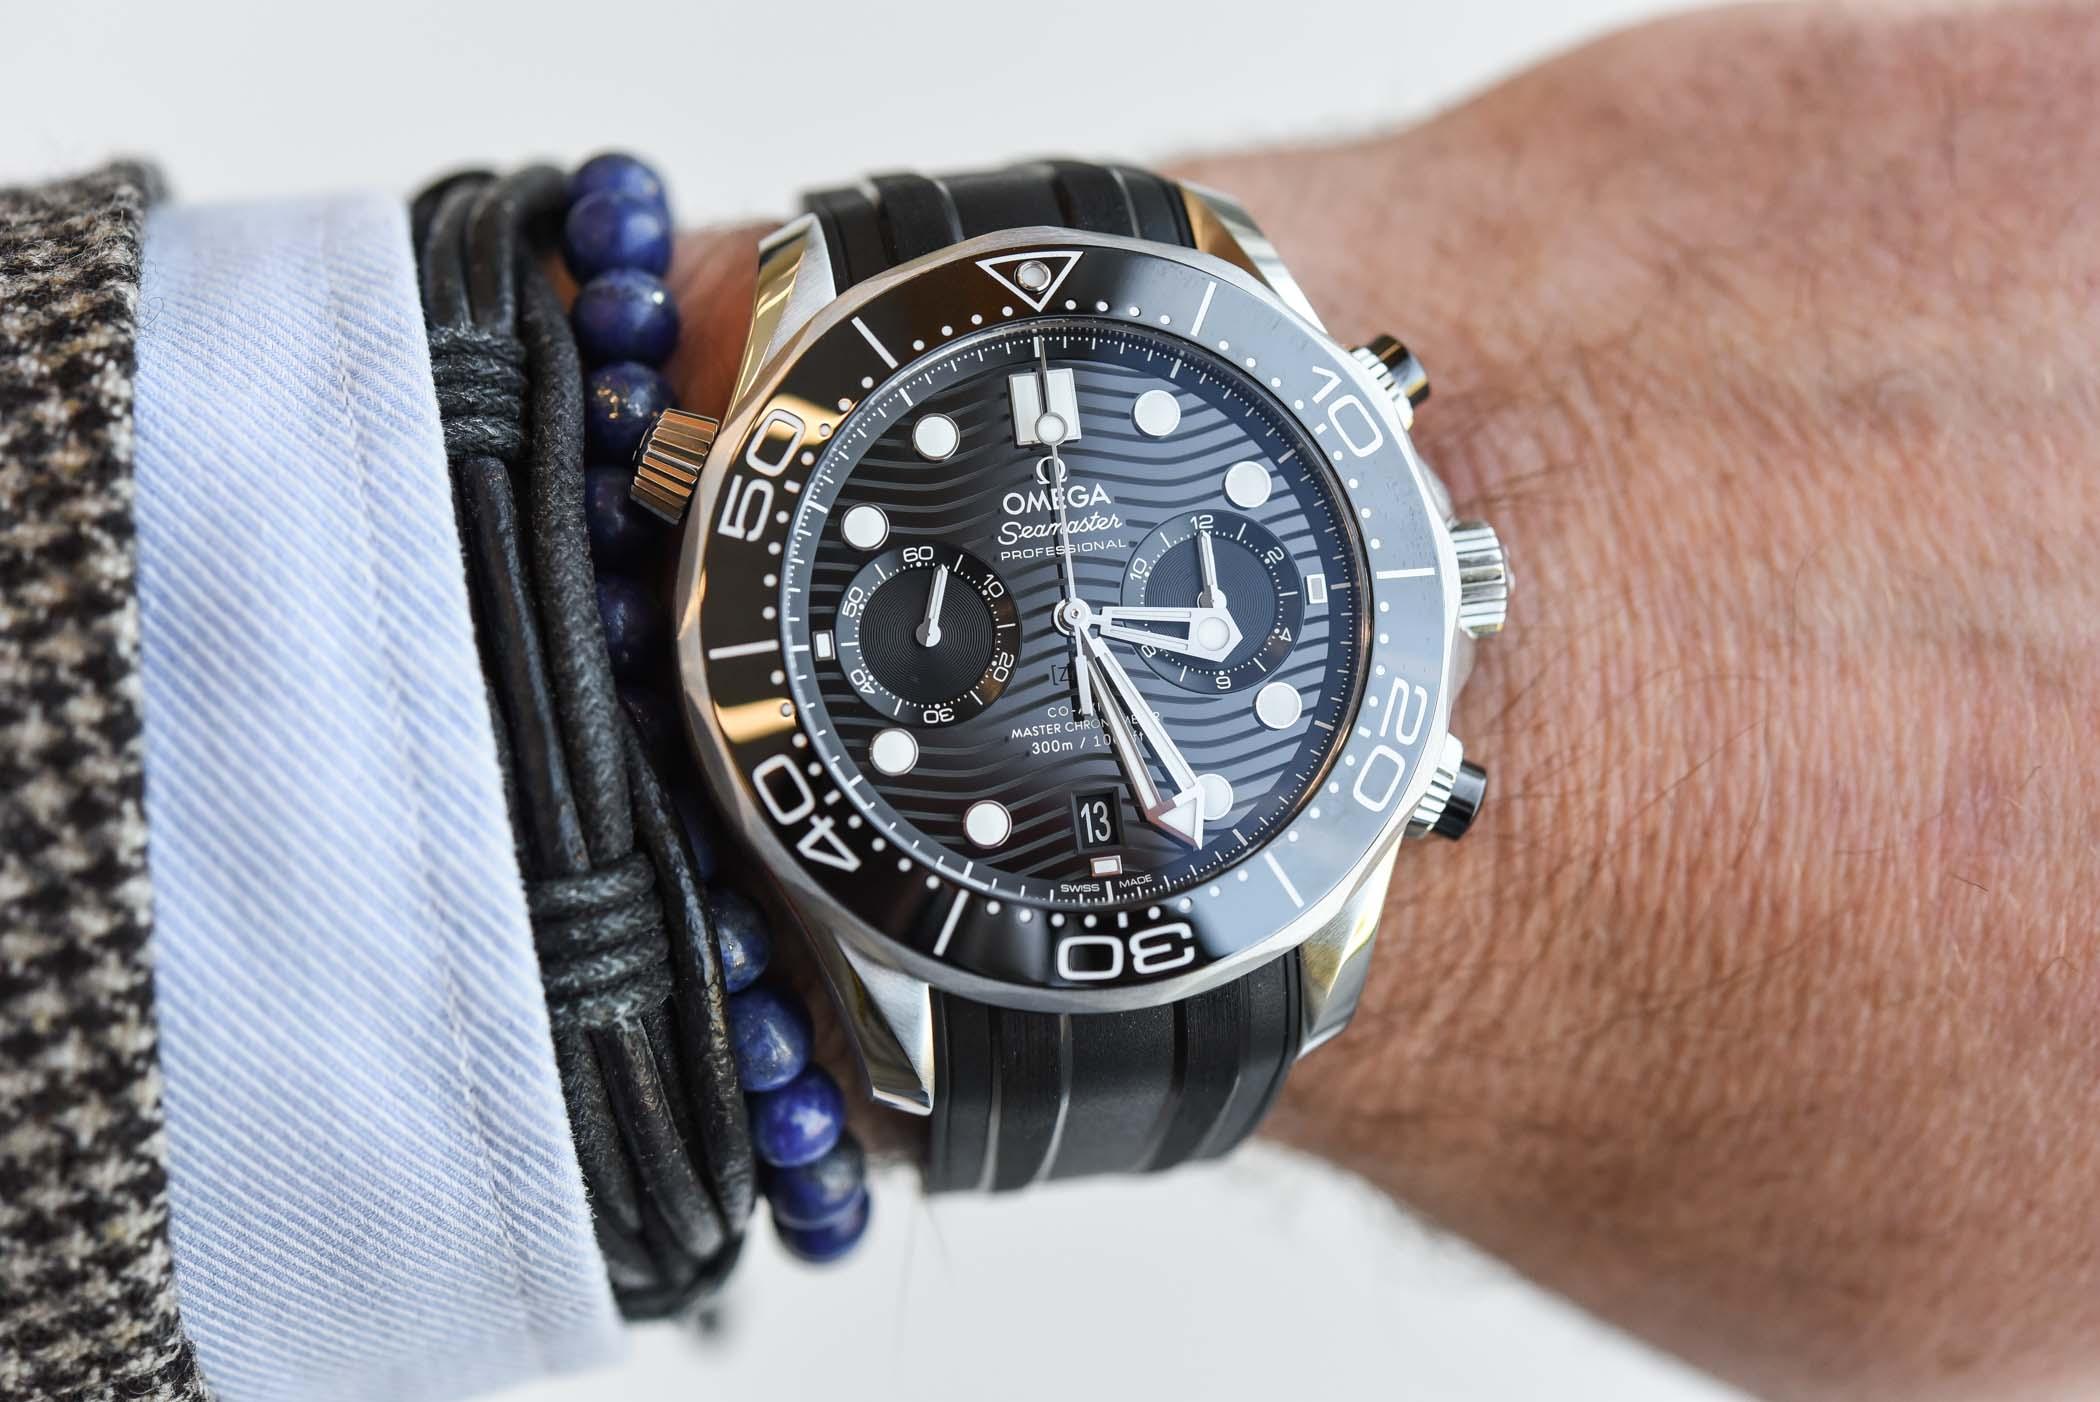 Omega Seamaster Diver 300M Chronograph Master Chronometer - 210.32.44.51.01.001